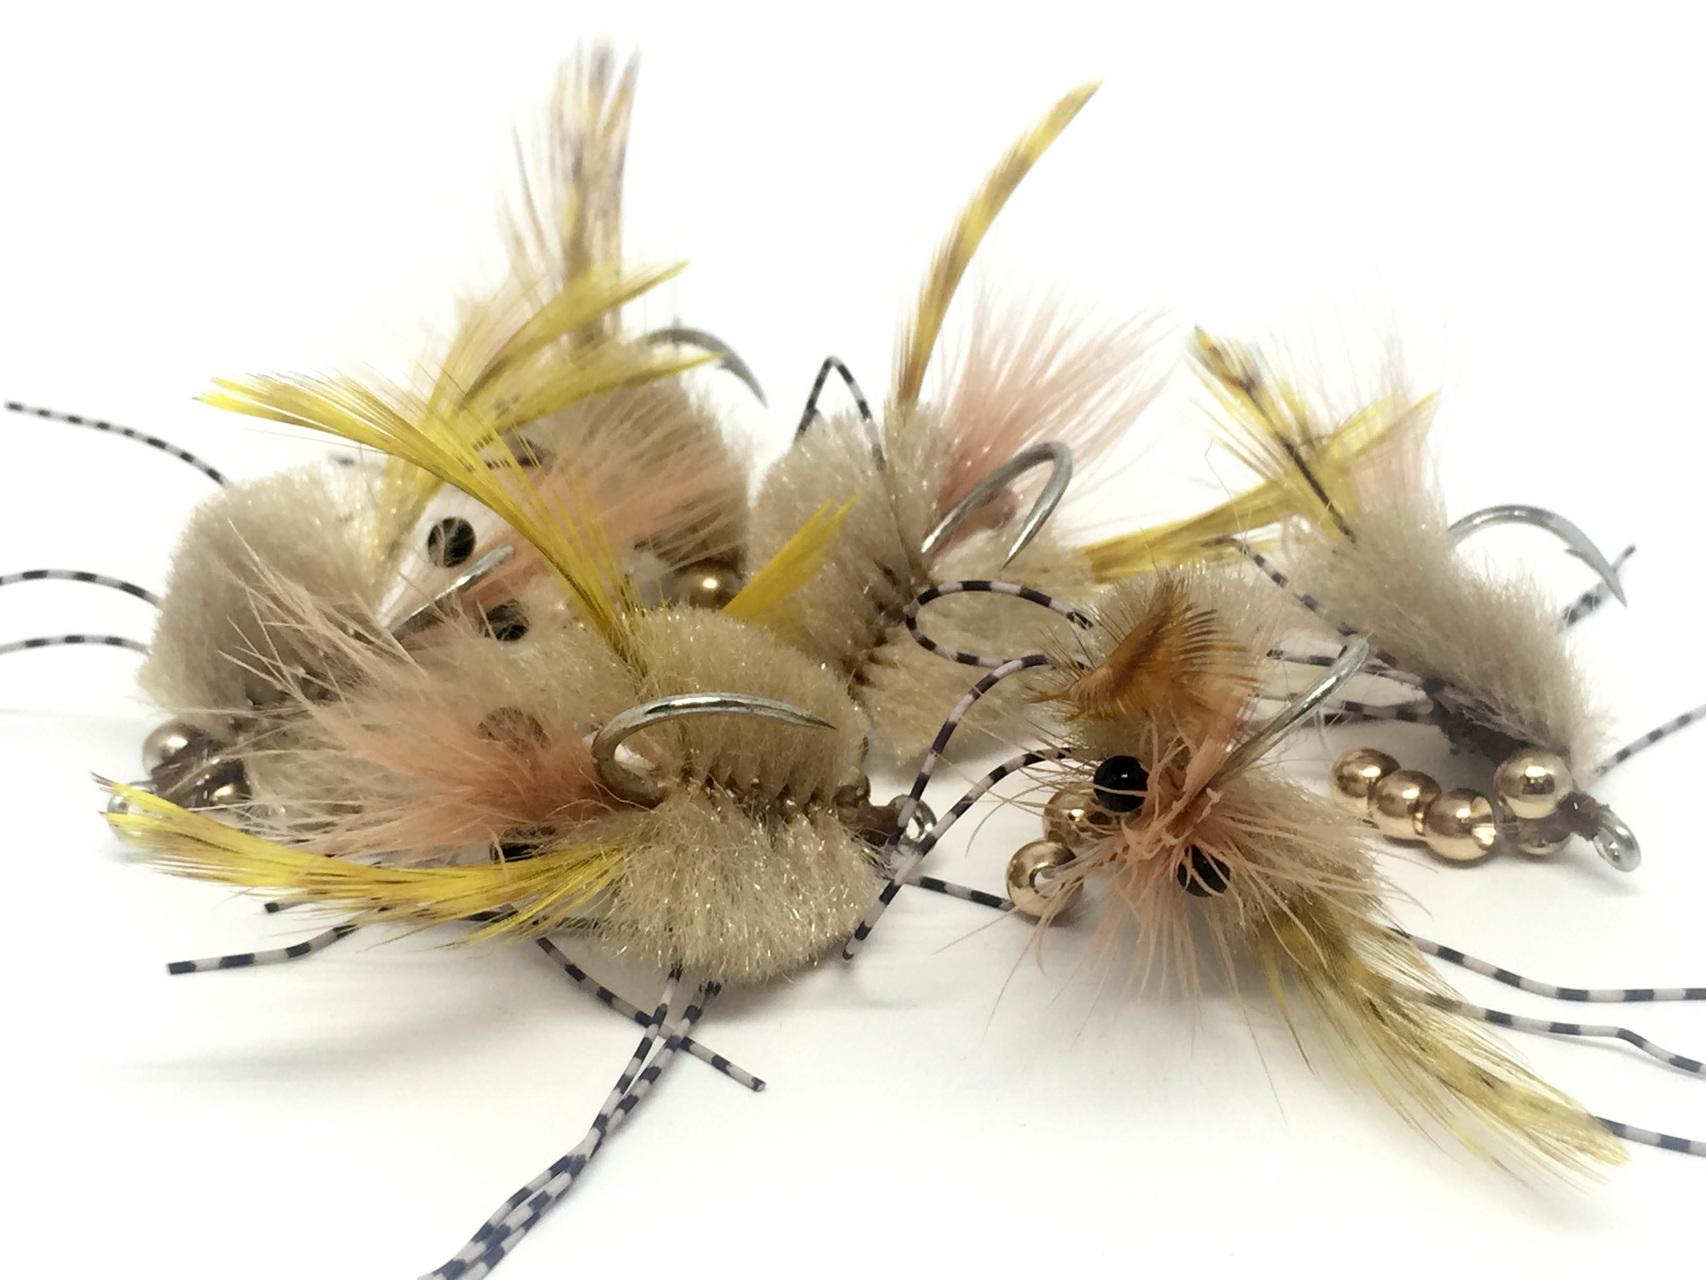 Saltwater Flies - Untamed Flies and Tackle